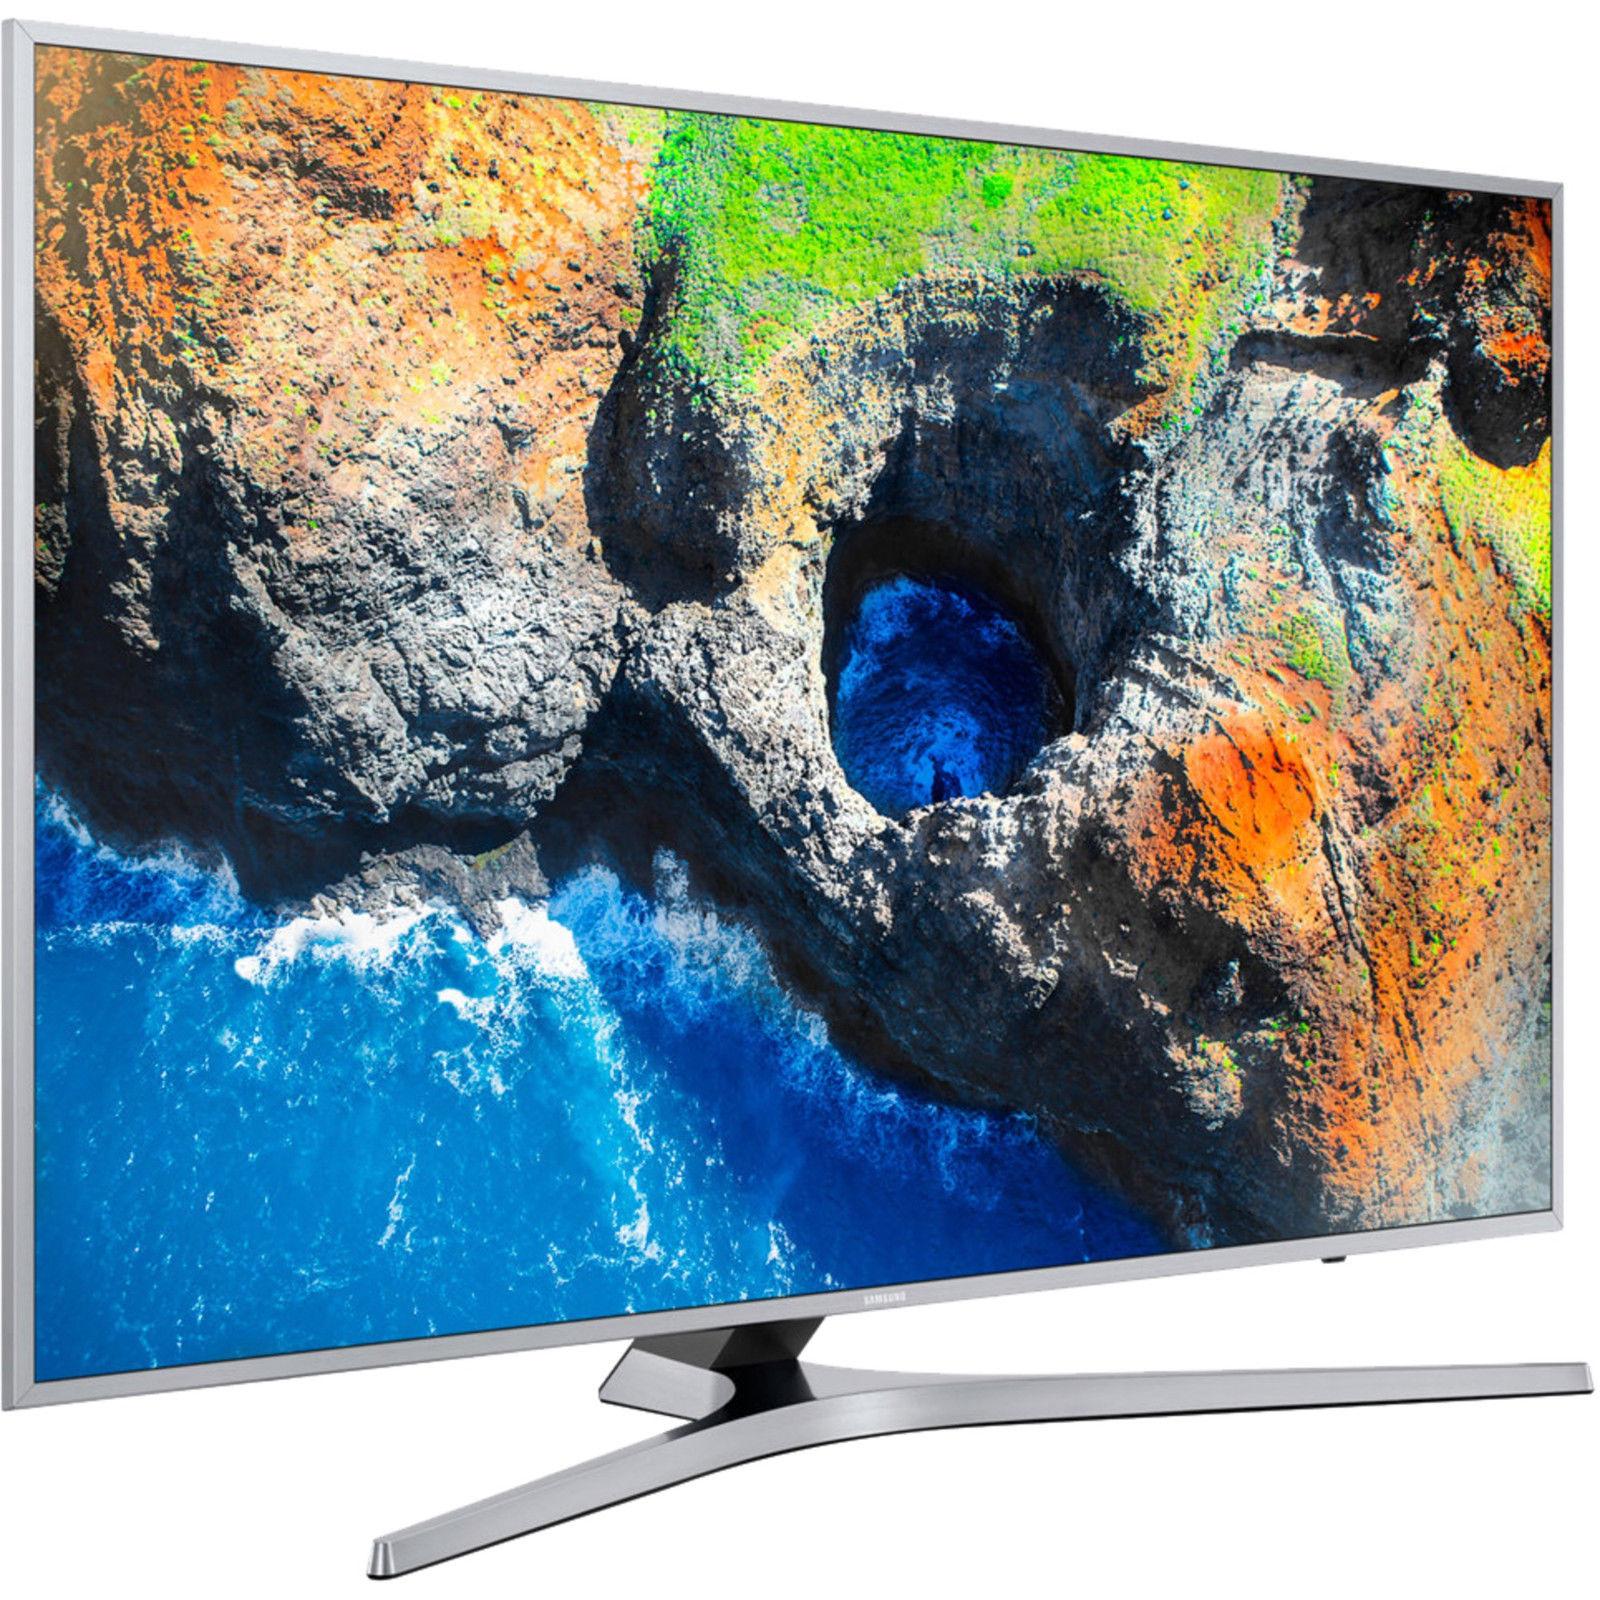 Samsung UE-55MU6400 55 Zoll UHD LED Smart TV Triple Tuner PQI 1500 PurColor